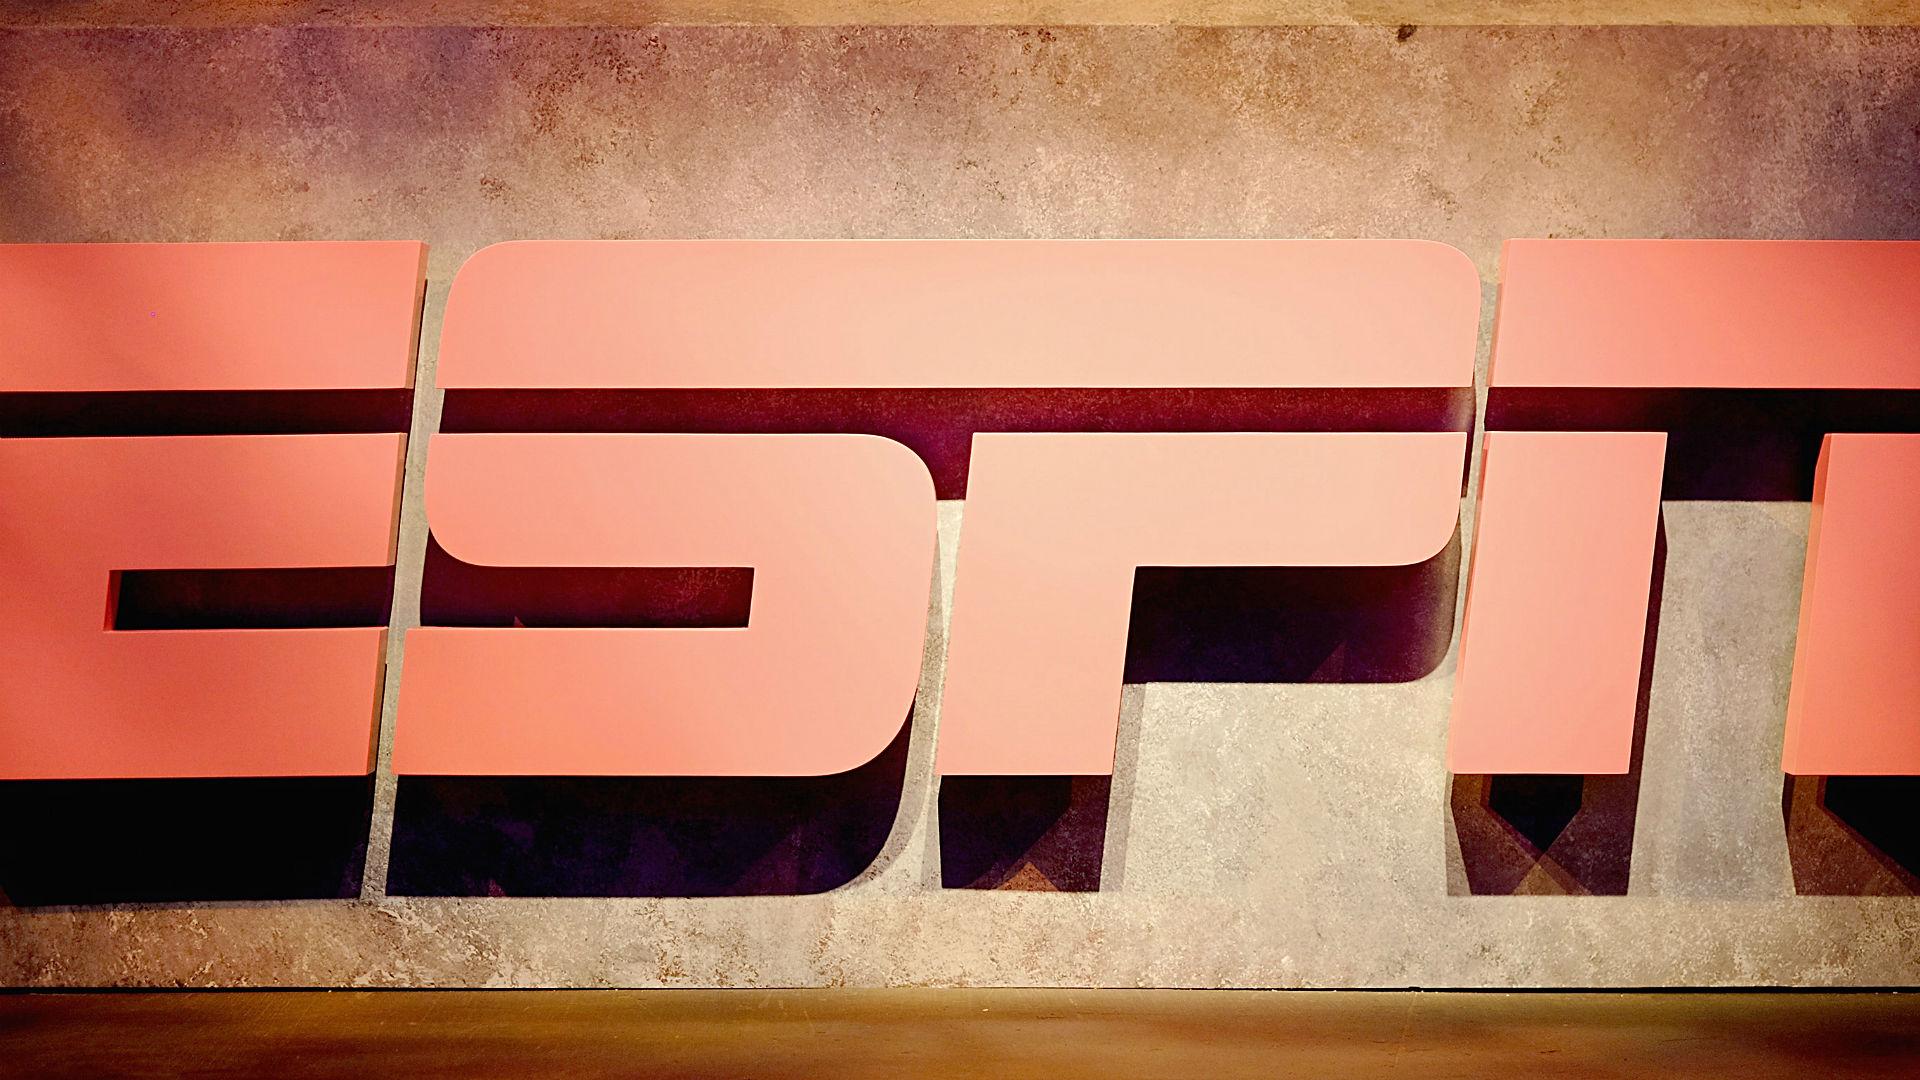 Eric Davis lands new ESPN radio show, will still appear on FS1